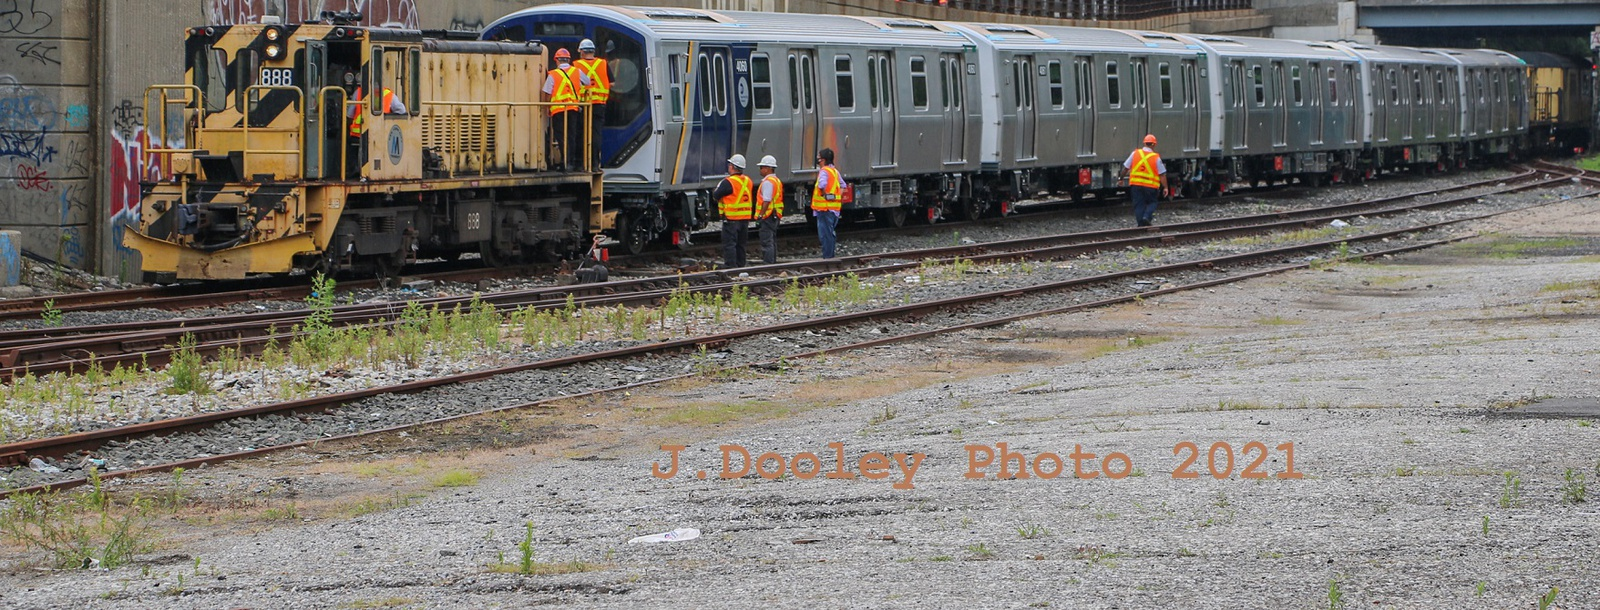 (567k, 1600x610)<br><b>Country:</b> United States<br><b>City:</b> New York<br><b>System:</b> New York City Transit<br><b>Car:</b> R-211 (Kawasaki, 2021-)  <br><b>Photo by:</b> John Dooley<br><b>Date:</b> 7/1/2021<br><b>Notes:</b> R-211 delivery and press conference.<br><b>Viewed (this week/total):</b> 0 / 244